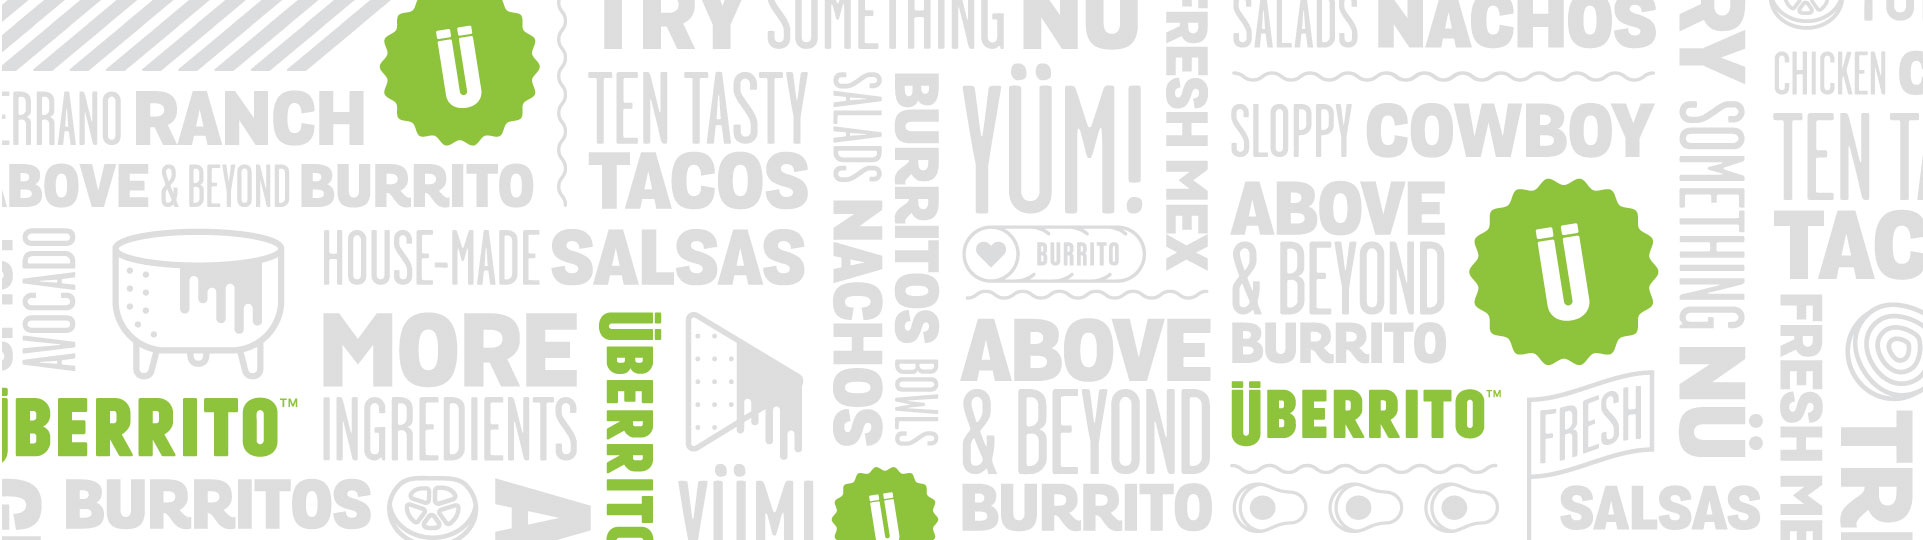 Uberrito fast-casual restaurant branding